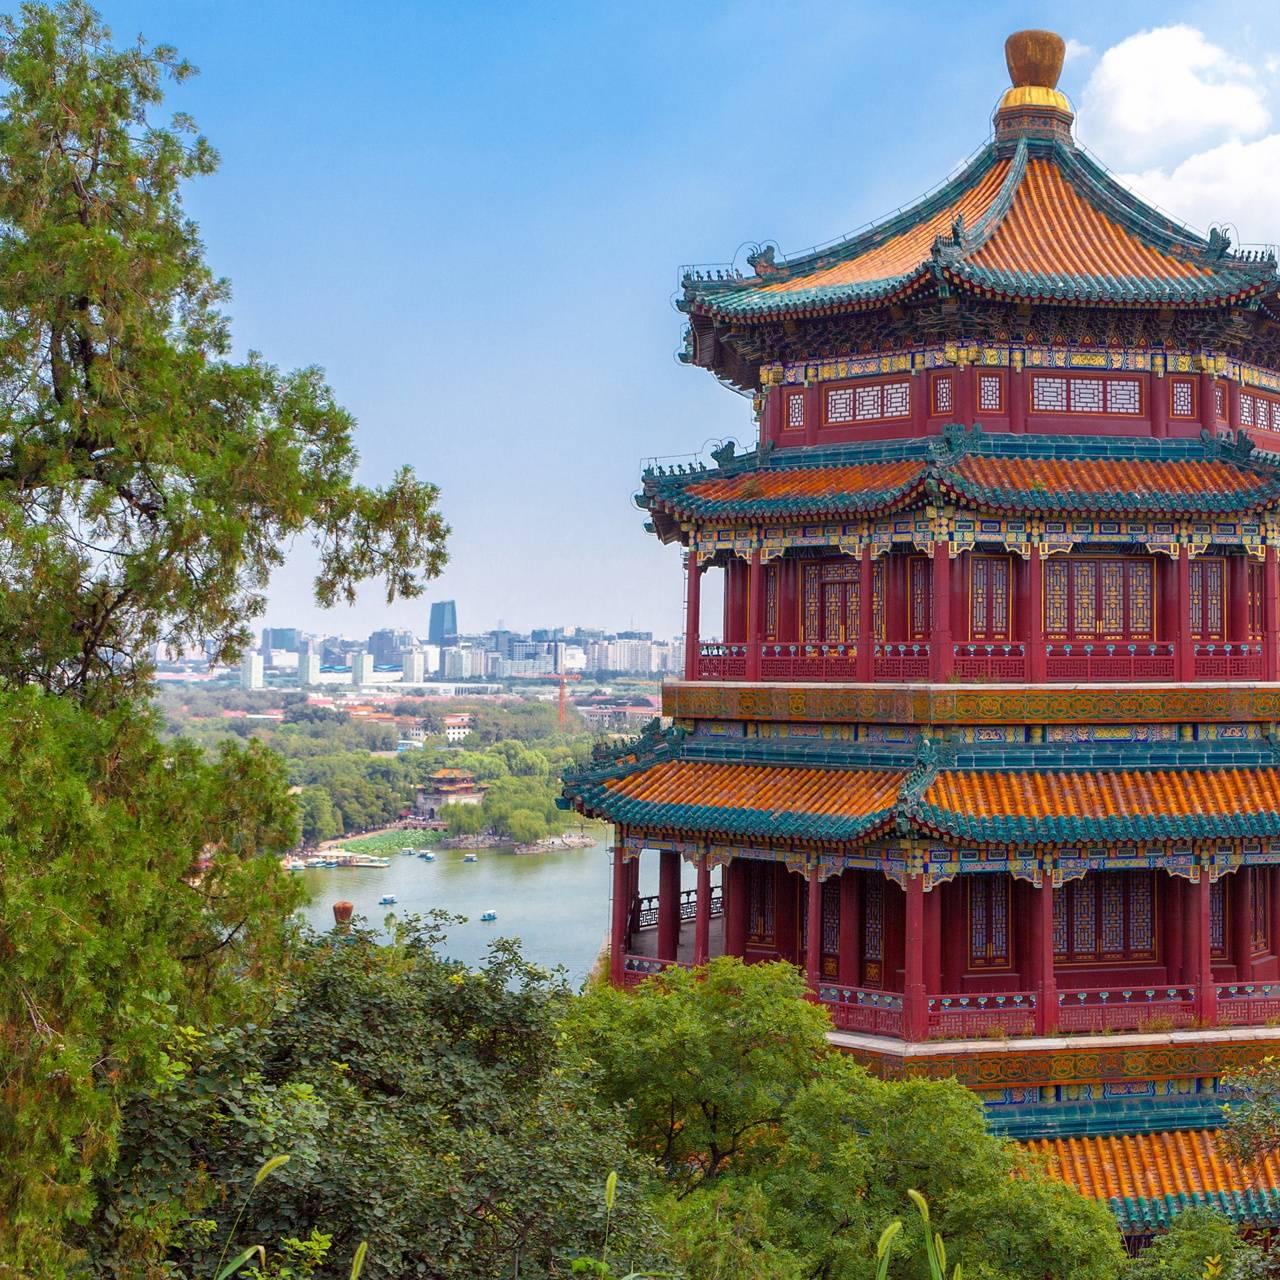 Asia Palace